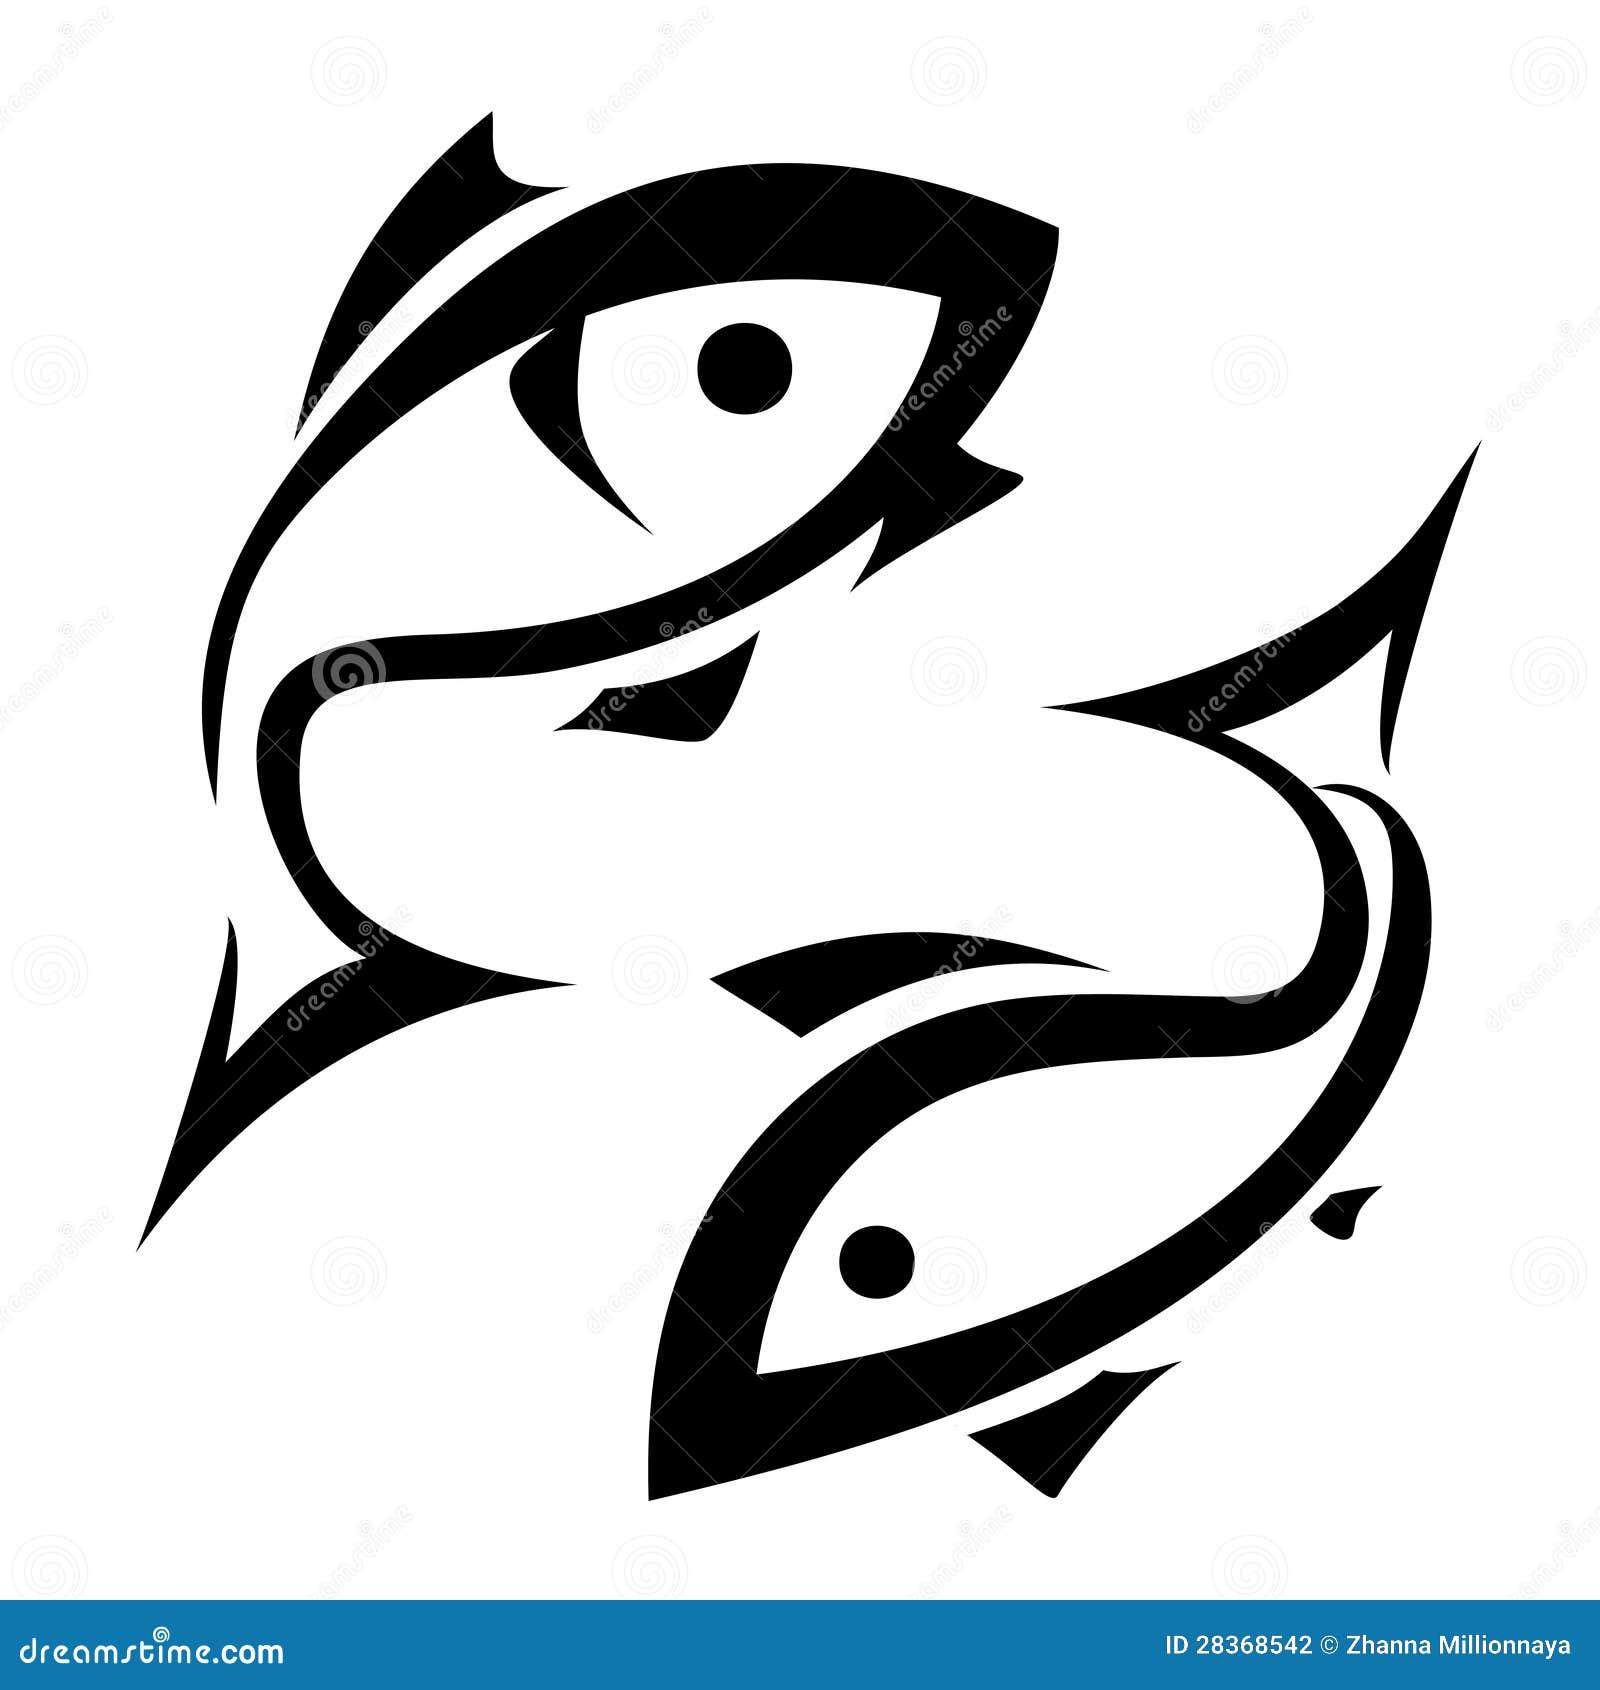 Logo Like Fish Symbol Stock Vector Illustration Of Stylized 28368542